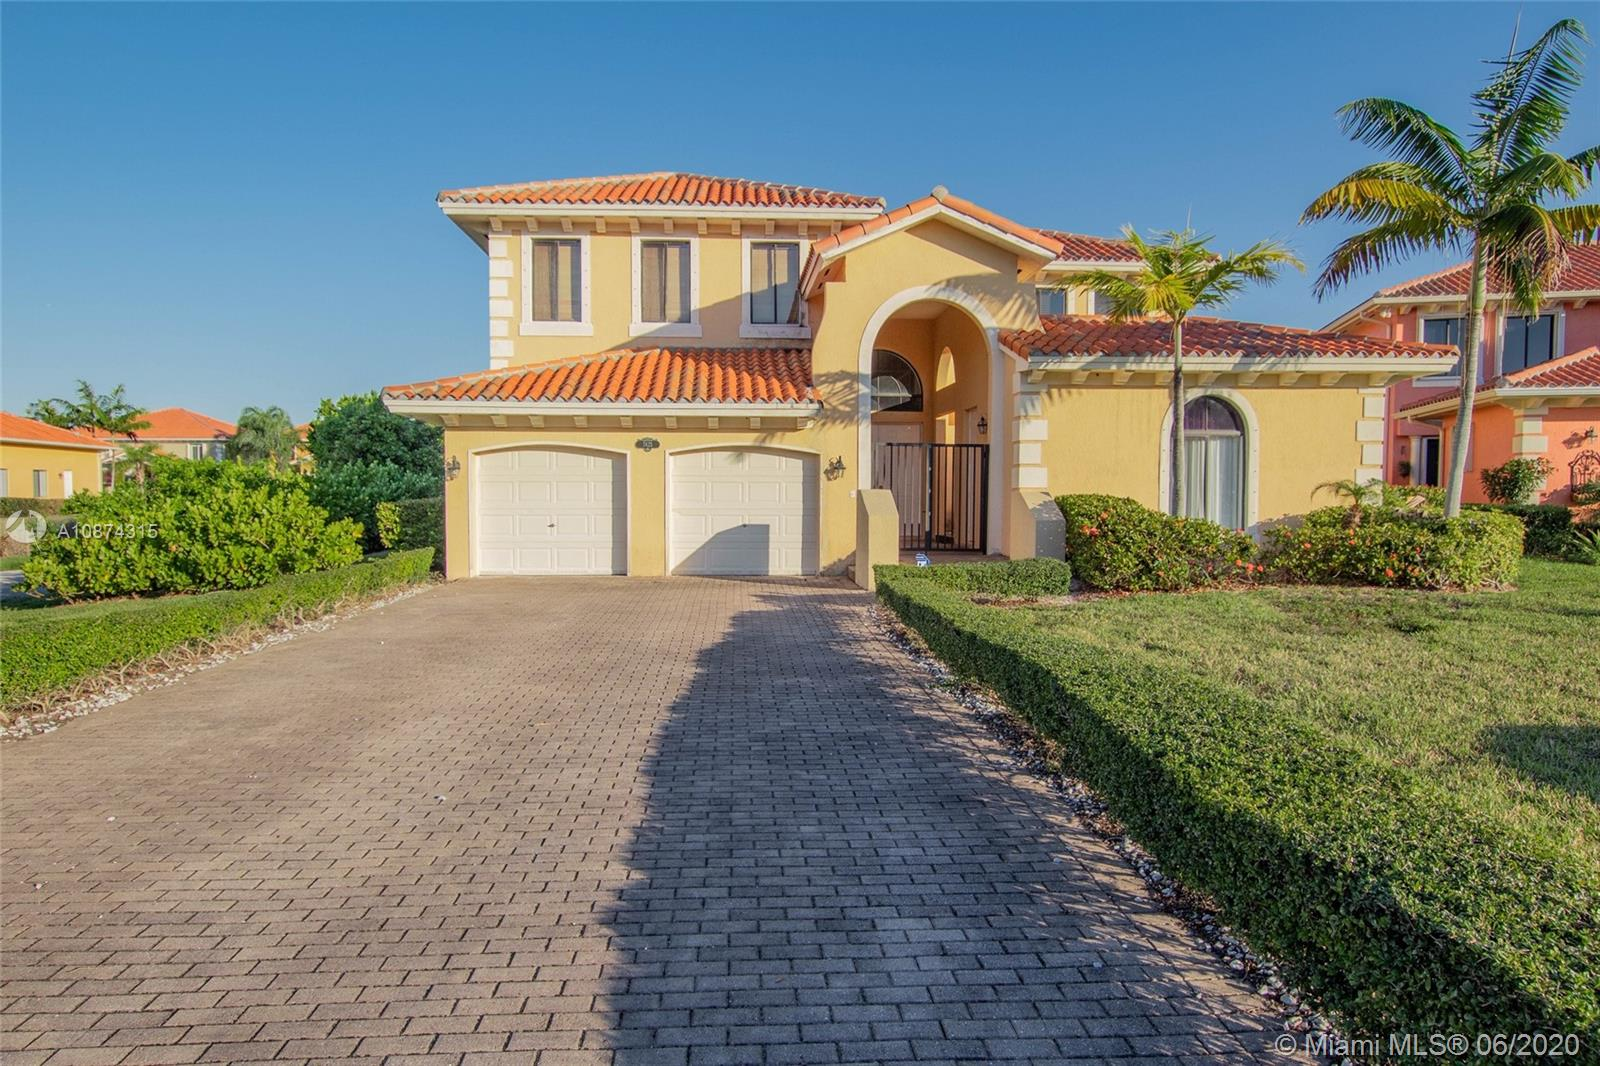 7625 SW 193rd Ln Property Photo - Miami, FL real estate listing